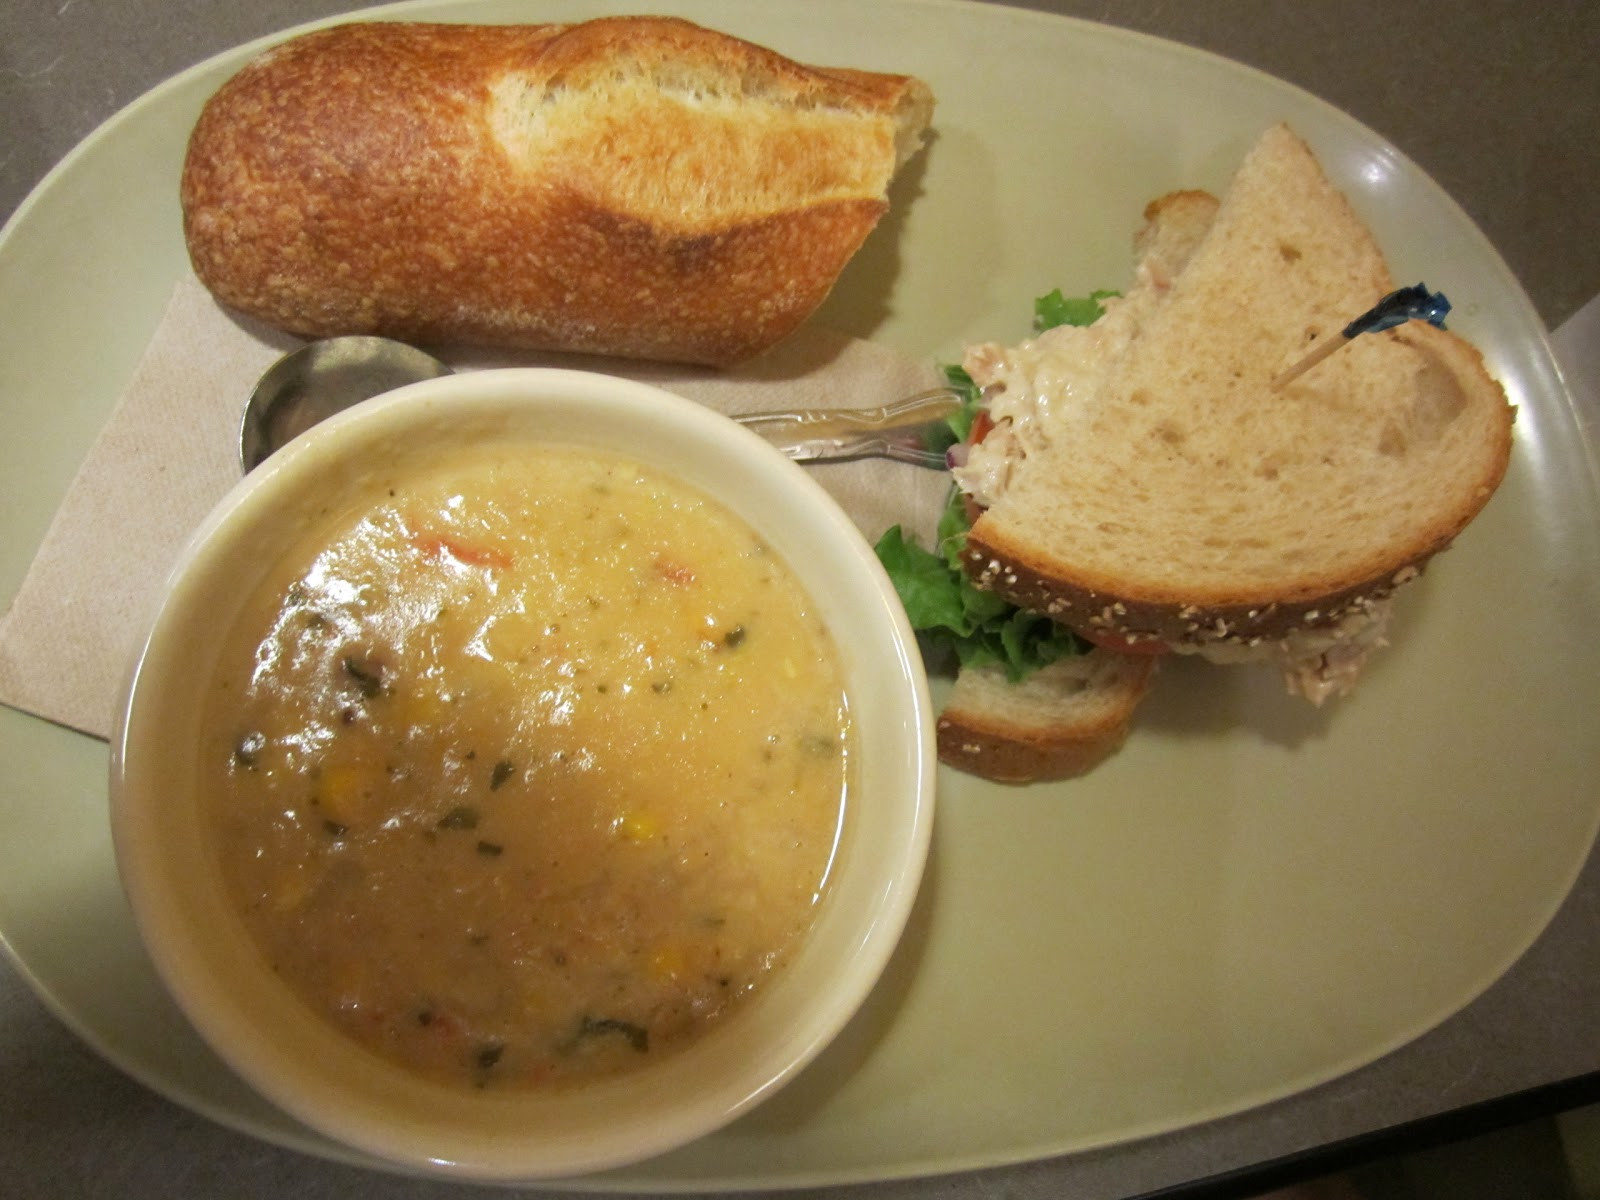 Panera Summer Corn Chowder Recipe  Panera Bread Restaurant Copycat Recipes Summer Corn Chowder